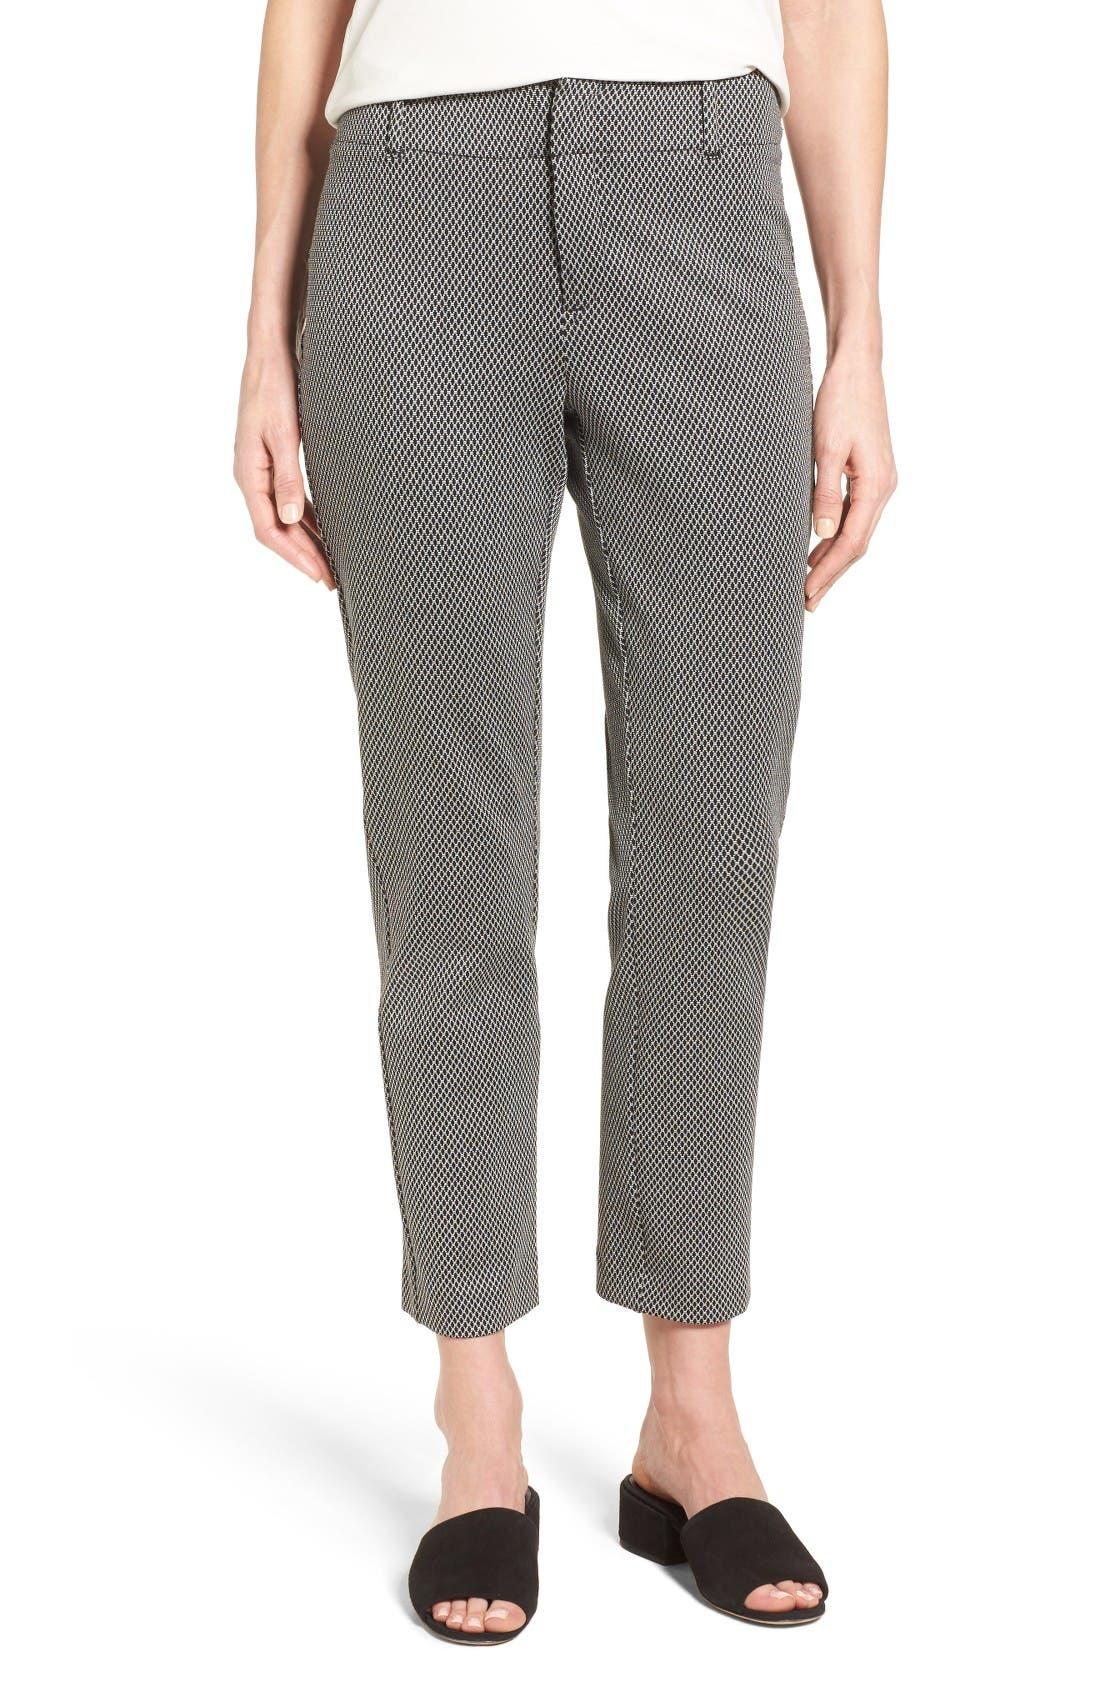 Main Image - NYDJ Renee Stretch Jacquard Ankle Pants